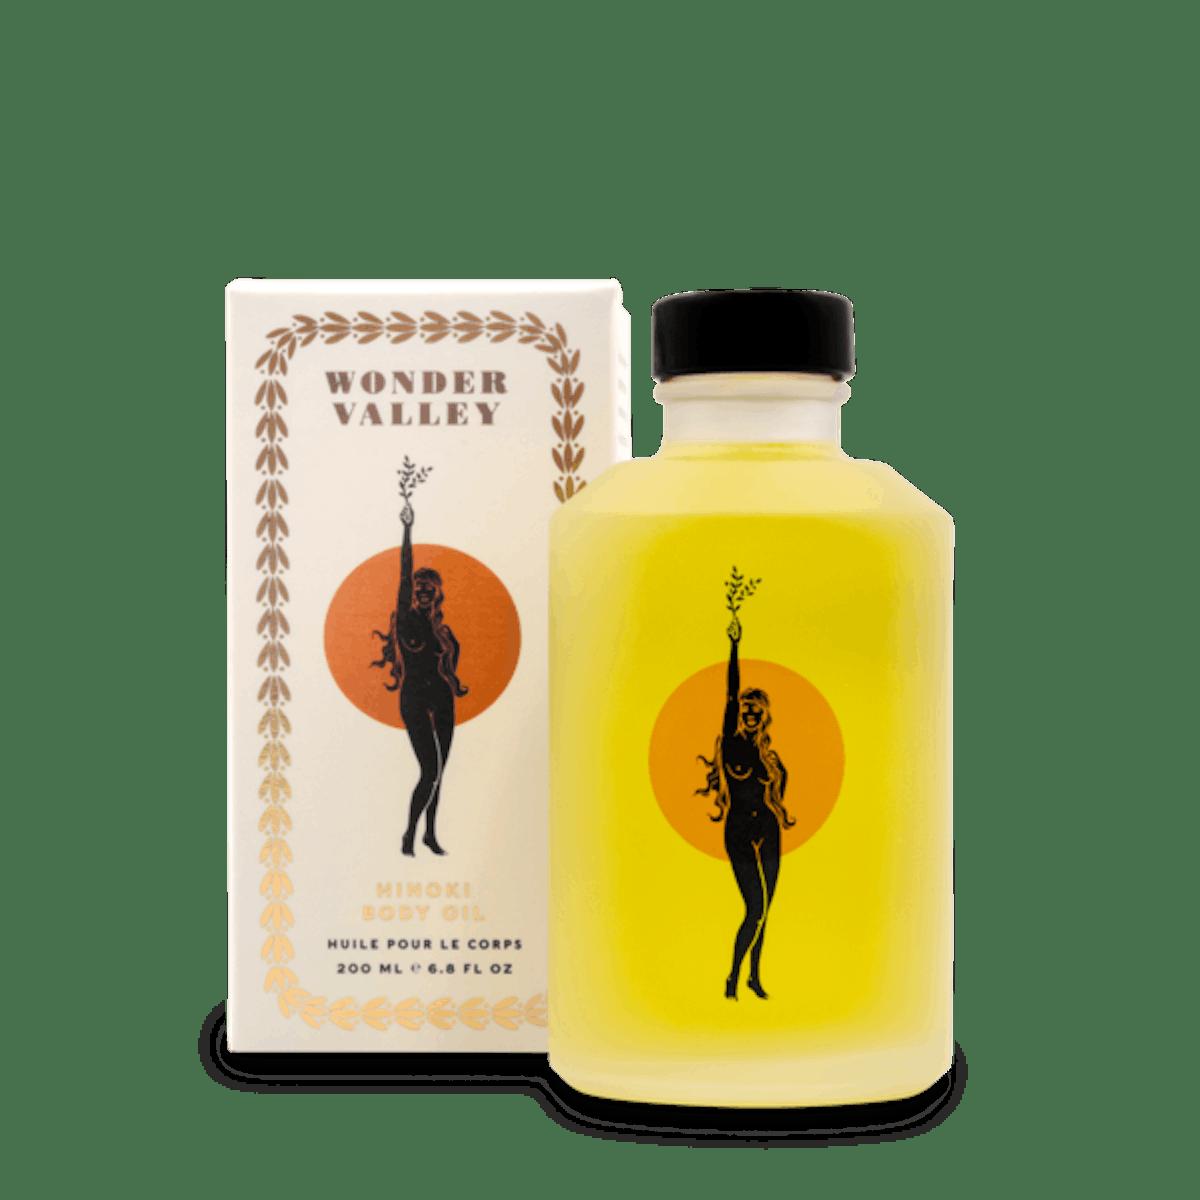 Hinoki Body Oil